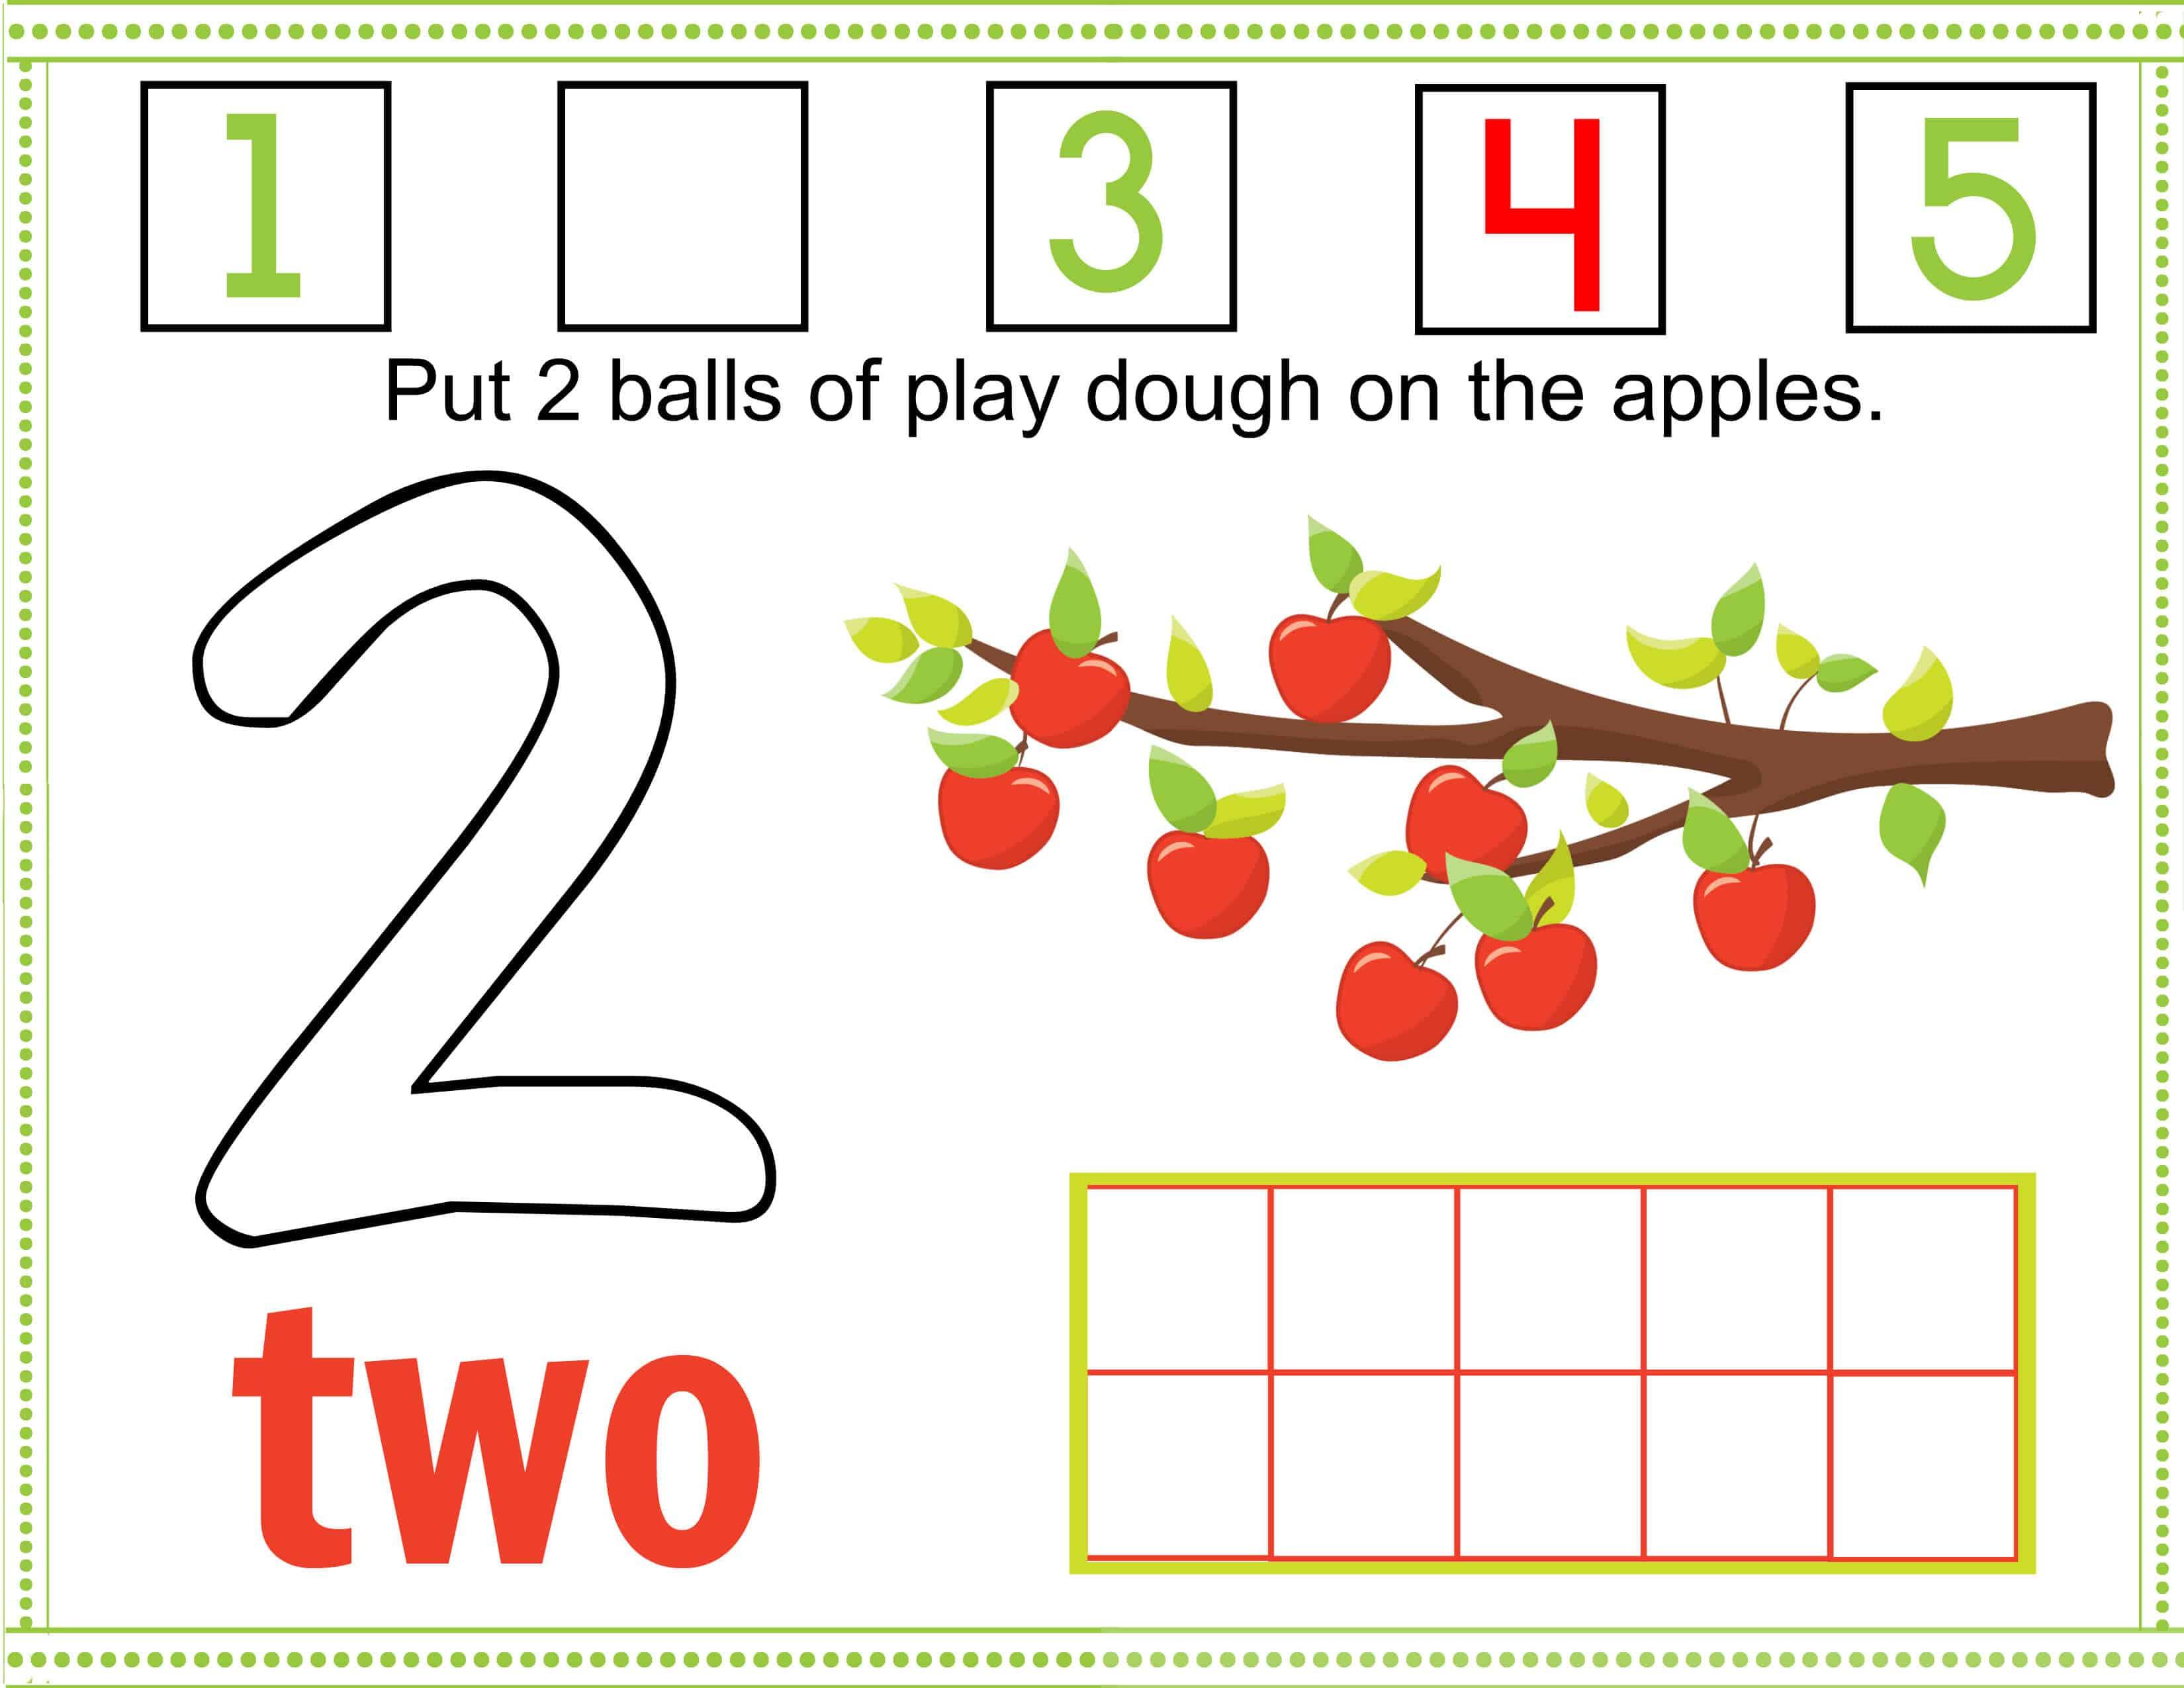 Free Printable Fall Apple Tree Numbers Play Dough Mats - Free Printable Playdough Mats